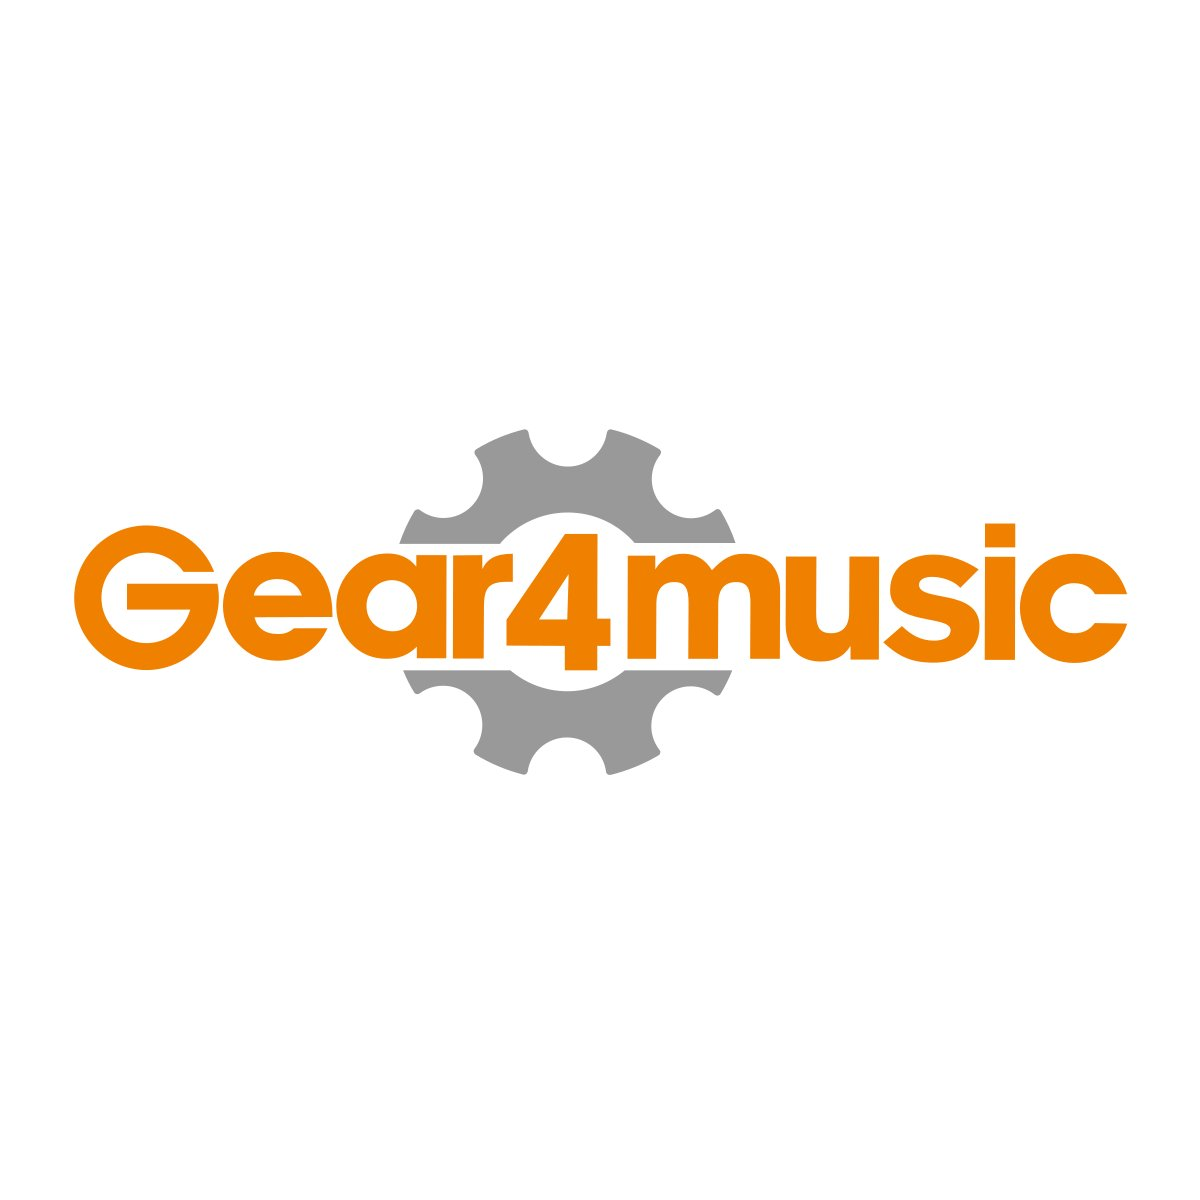 Image of Bass Trombone Straight Mute by Gear4music